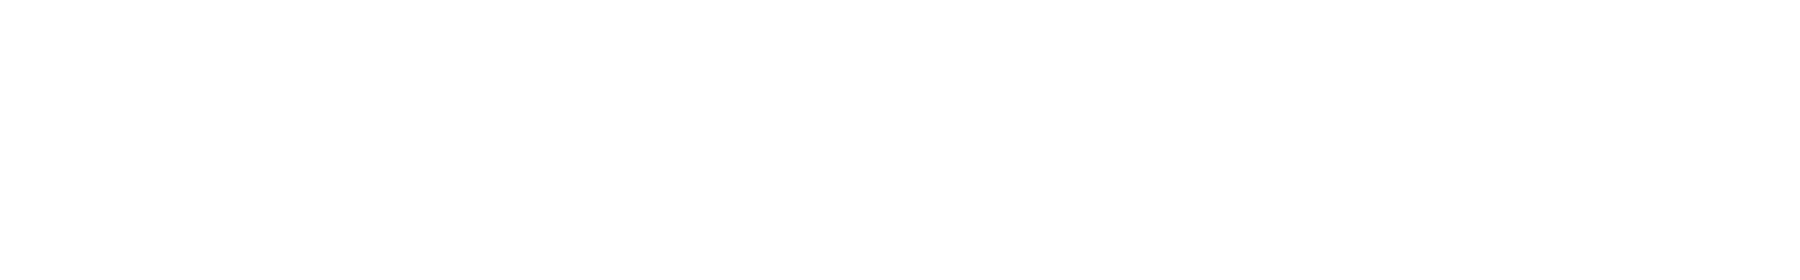 blbc jazzyripper 130 c